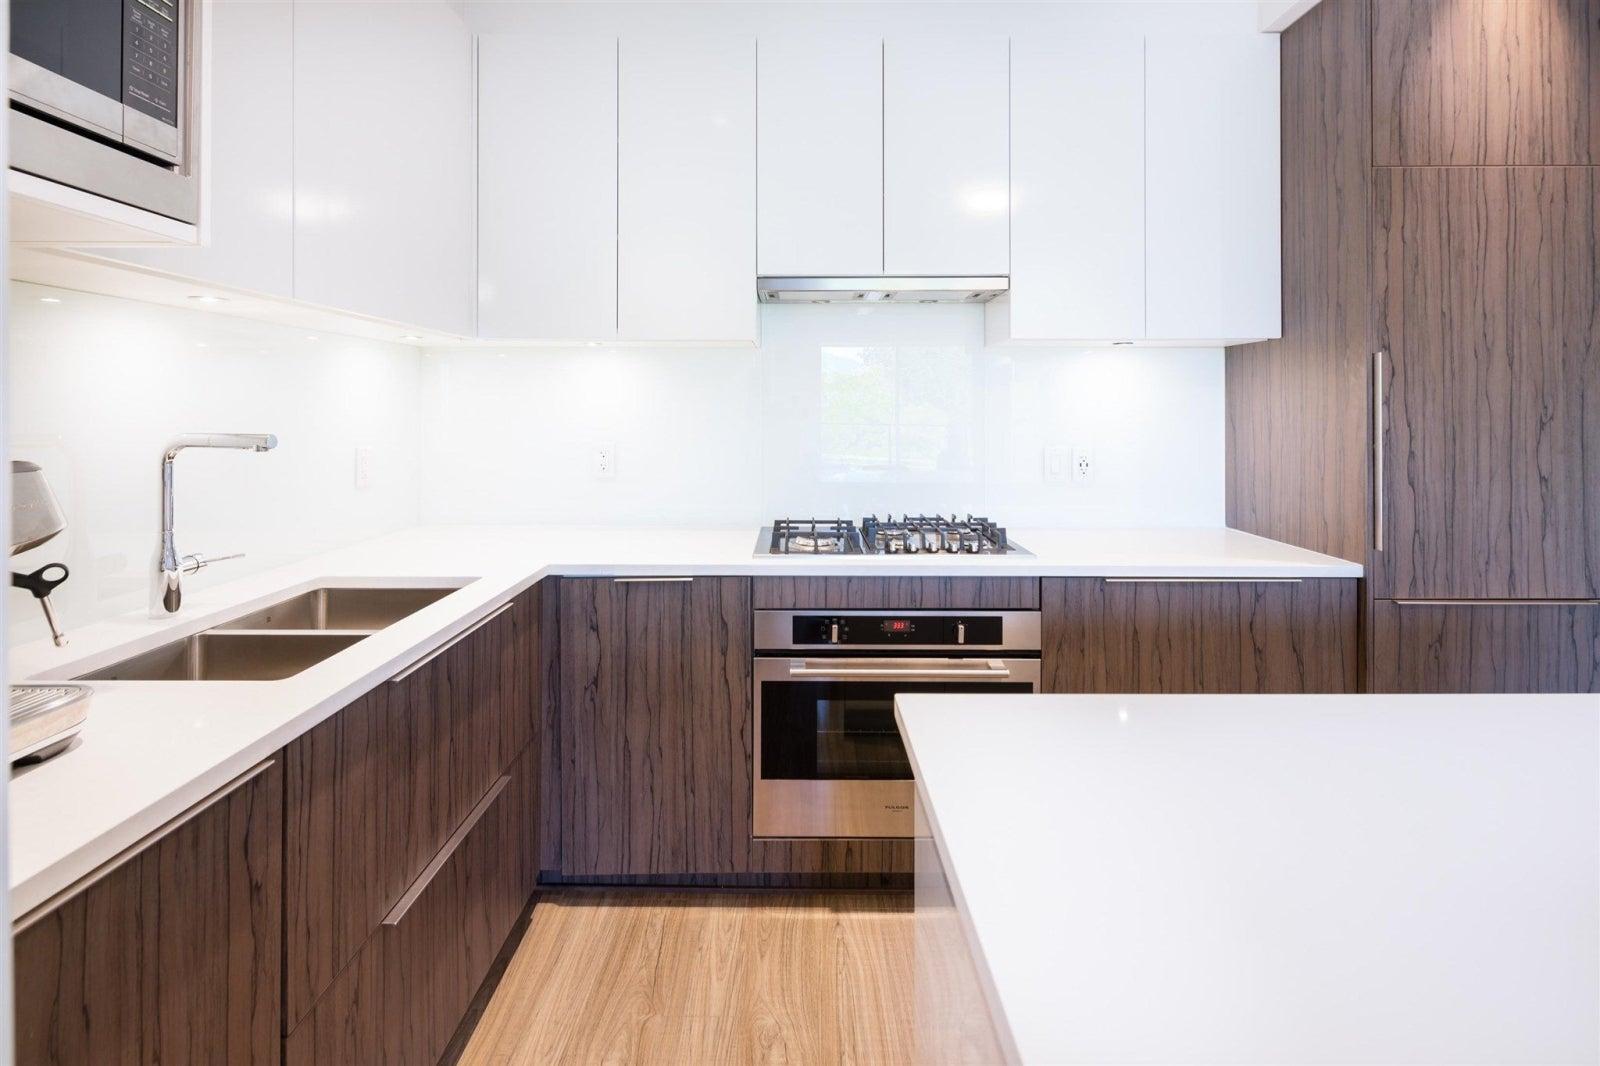 408 379 E BROADWAY AVENUE - Mount Pleasant VE Apartment/Condo for sale, 2 Bedrooms (R2599900) #2